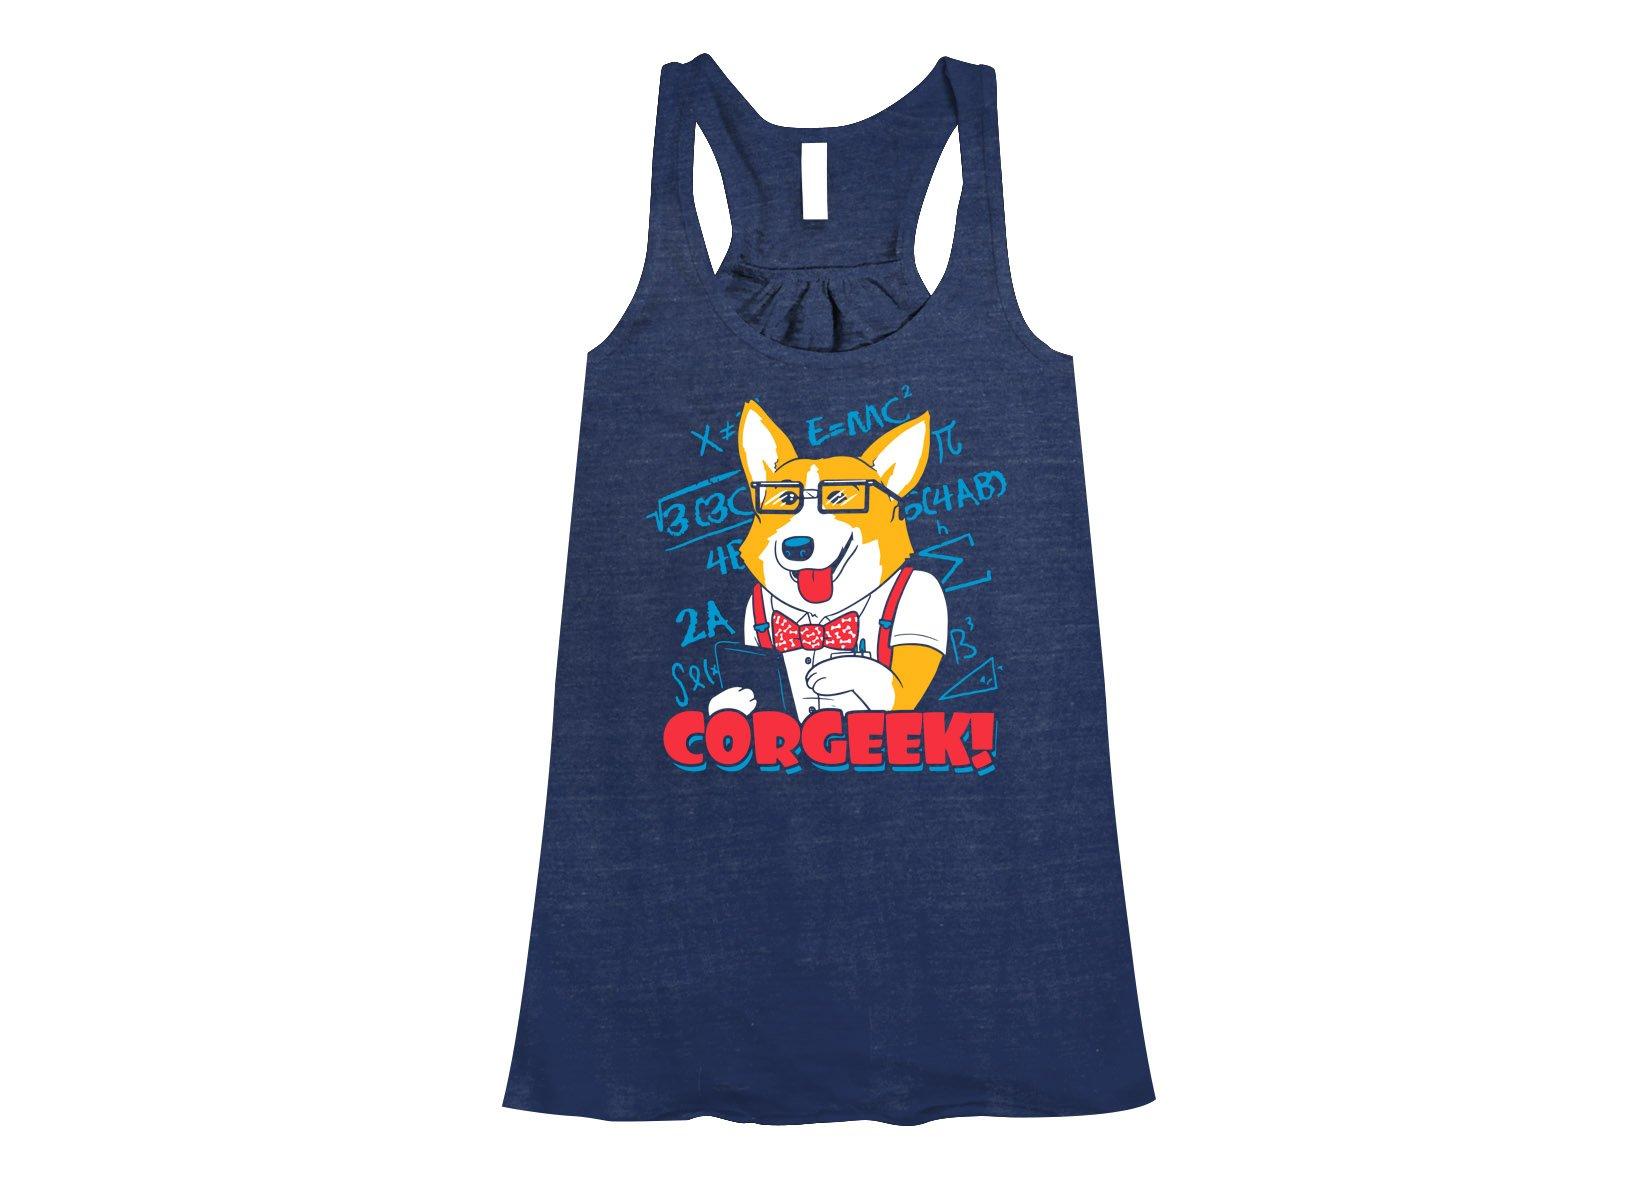 Corgeek on Womens Tanks T-Shirt